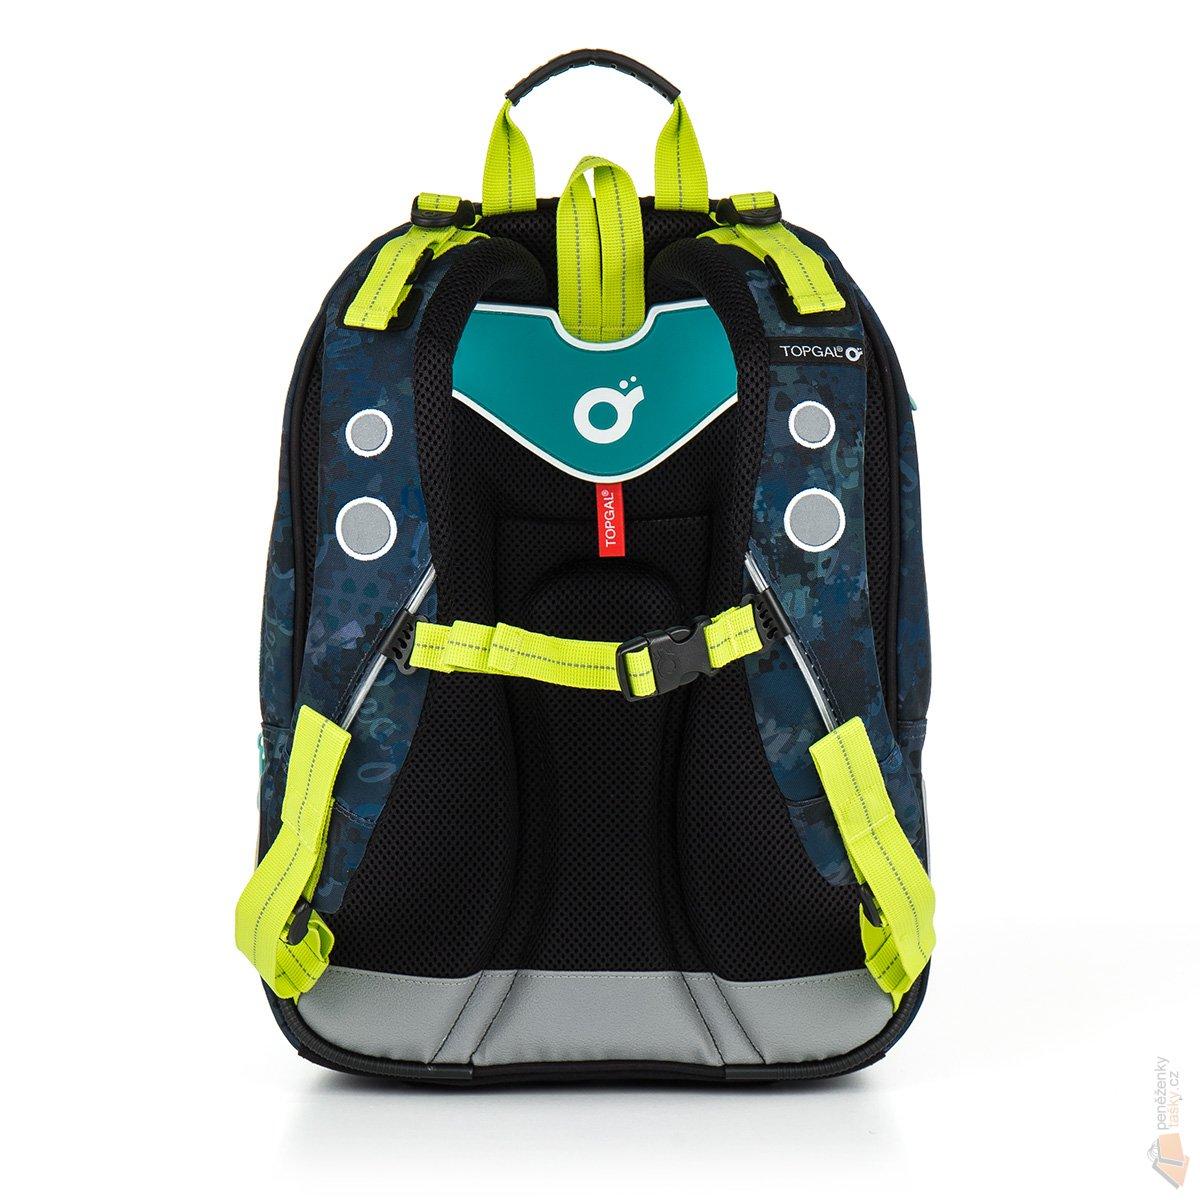 Topgal sada pro školáka set Small  Školní batoh CHI 878 D blue + ... aecaef81bb